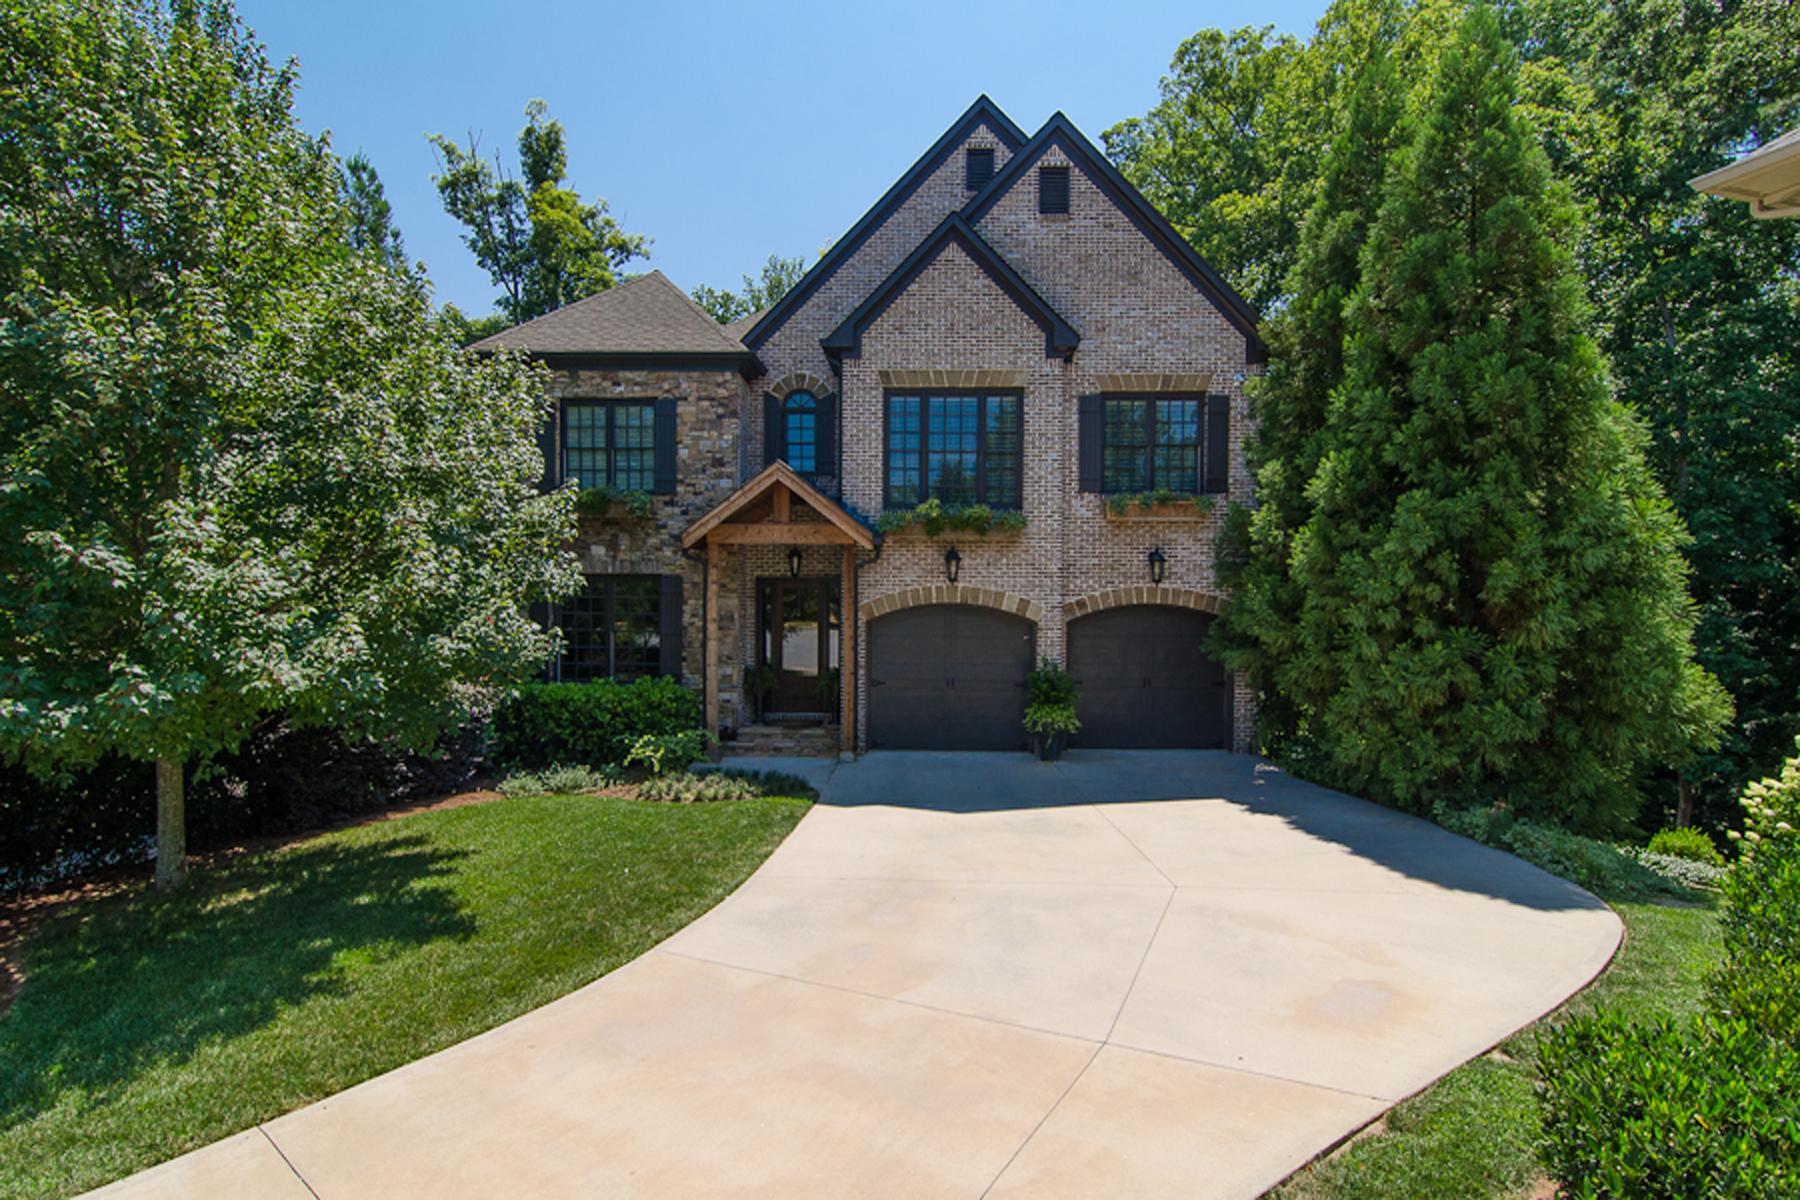 独户住宅 为 销售 在 Newer Construction, Riverwood Charter, Two Story 560 Cliftwood Court 桑迪, 乔治亚州, 30328 美国